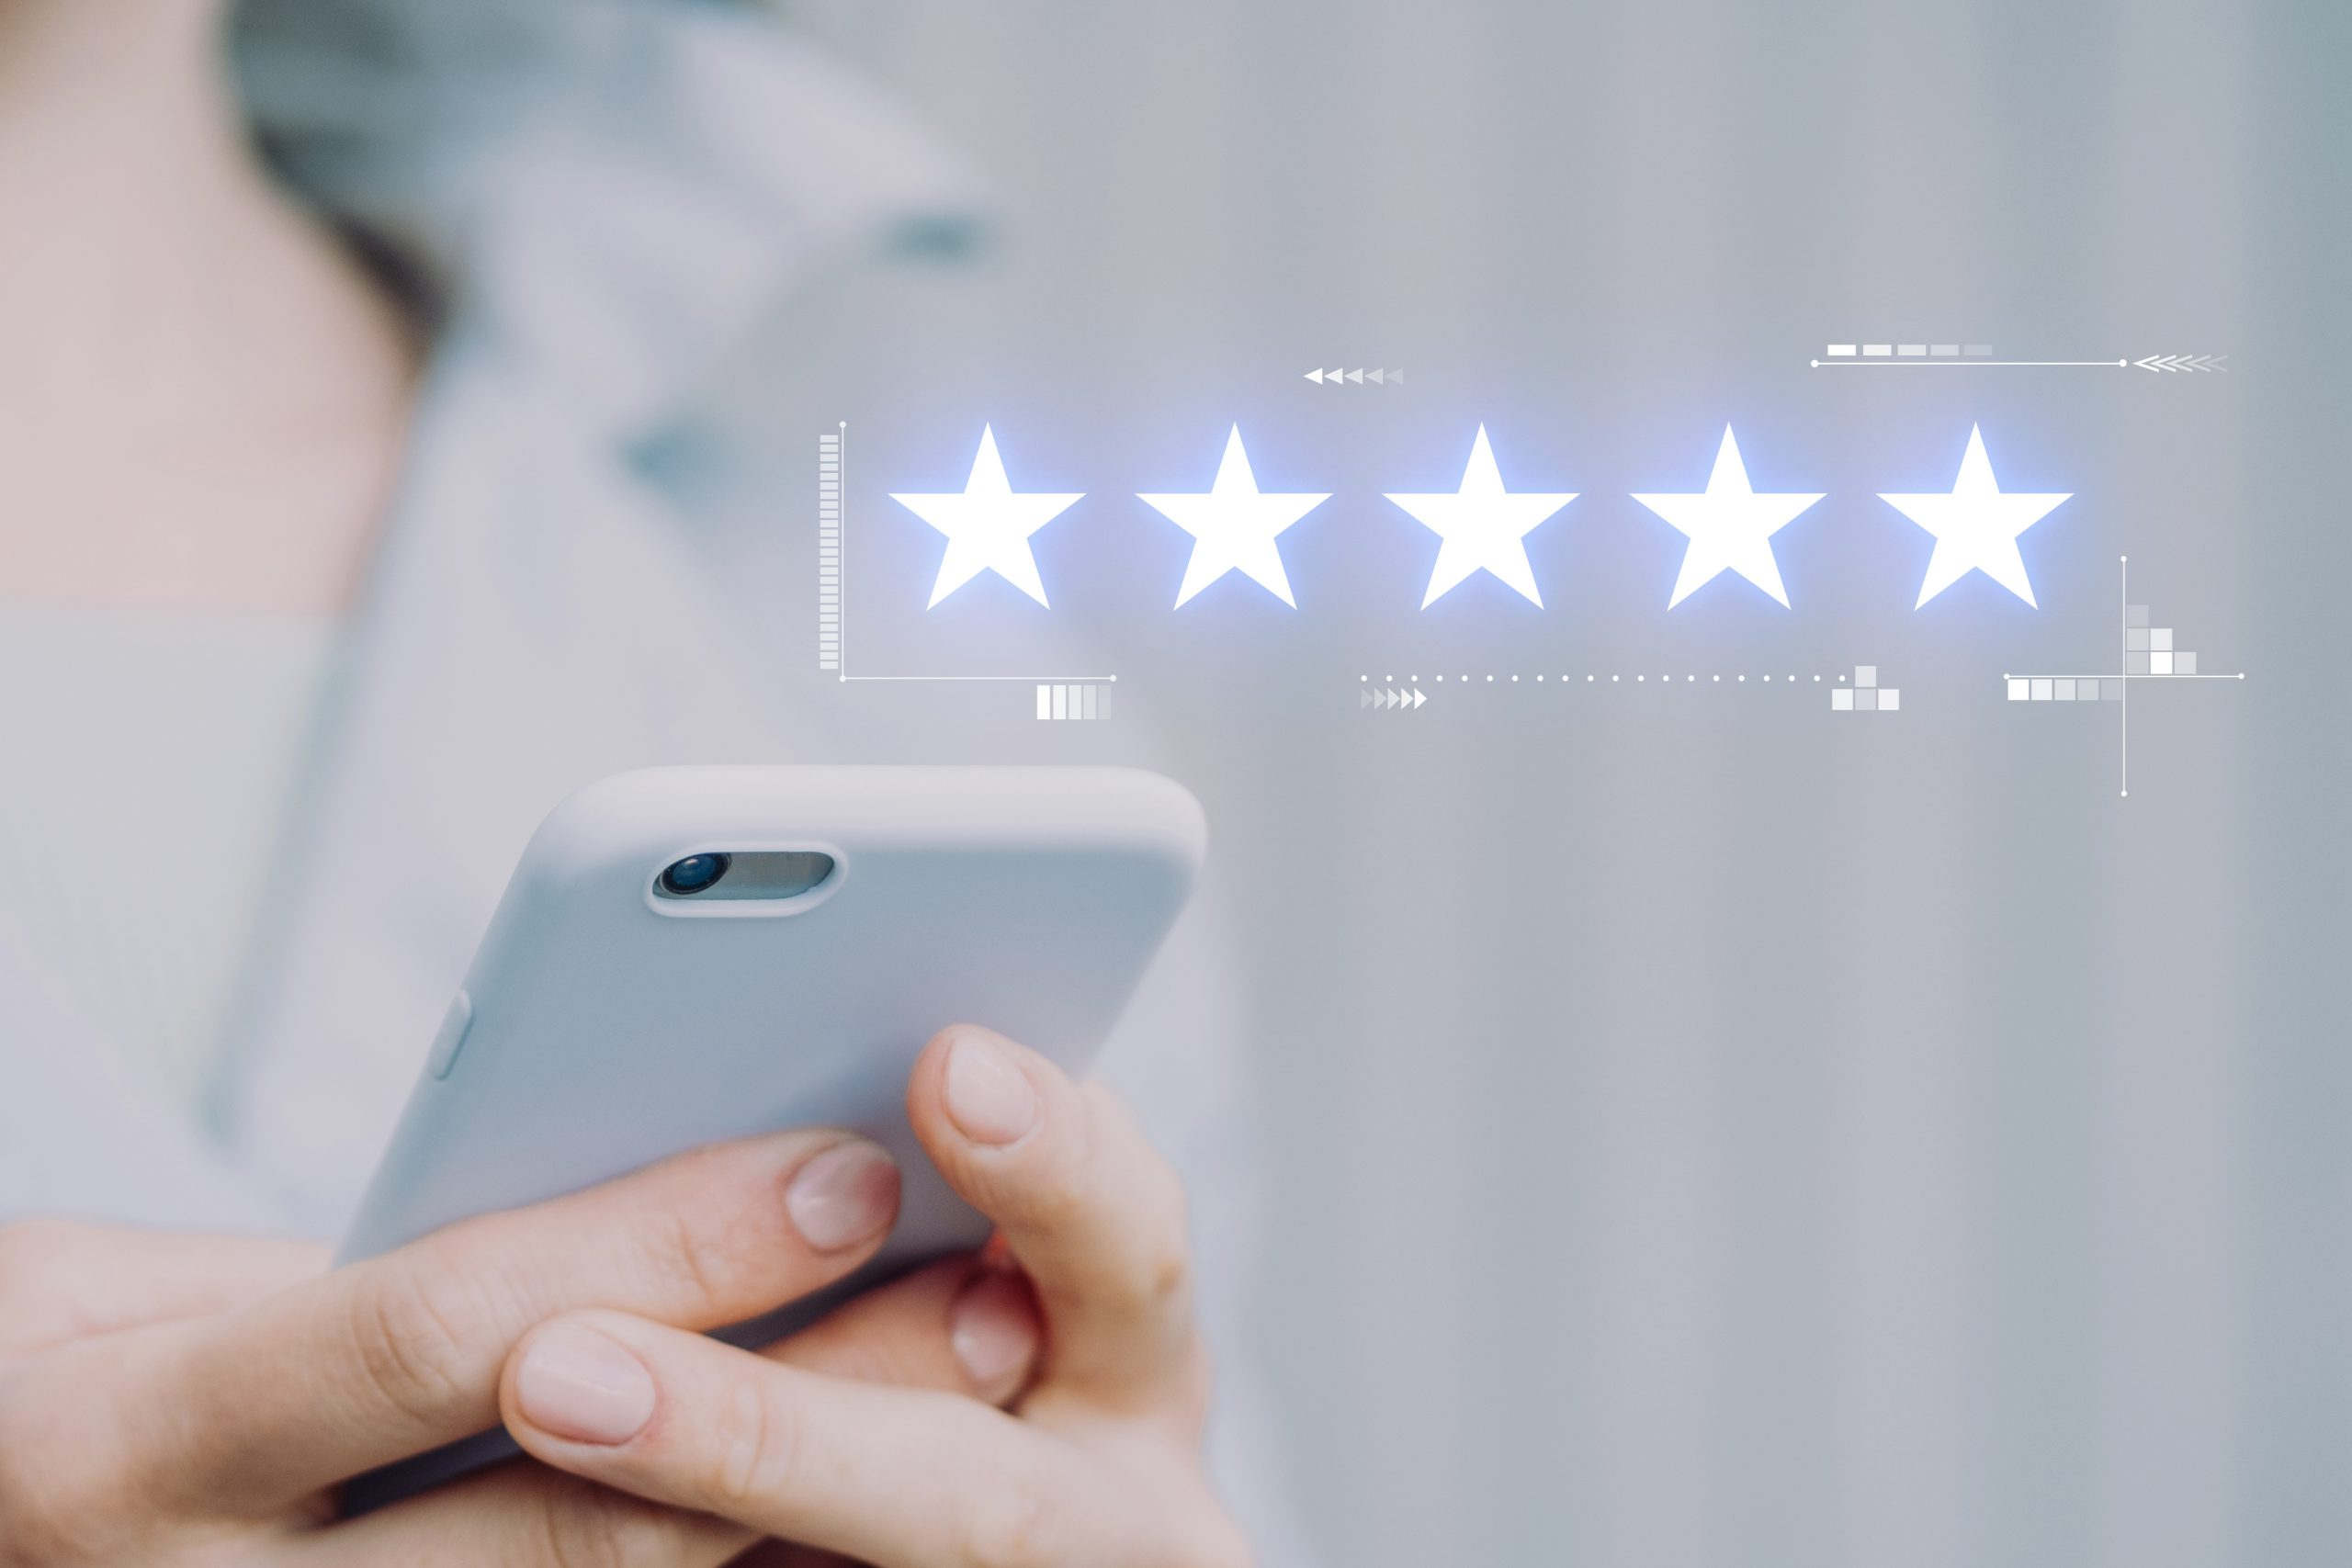 Online reviews, online ratings